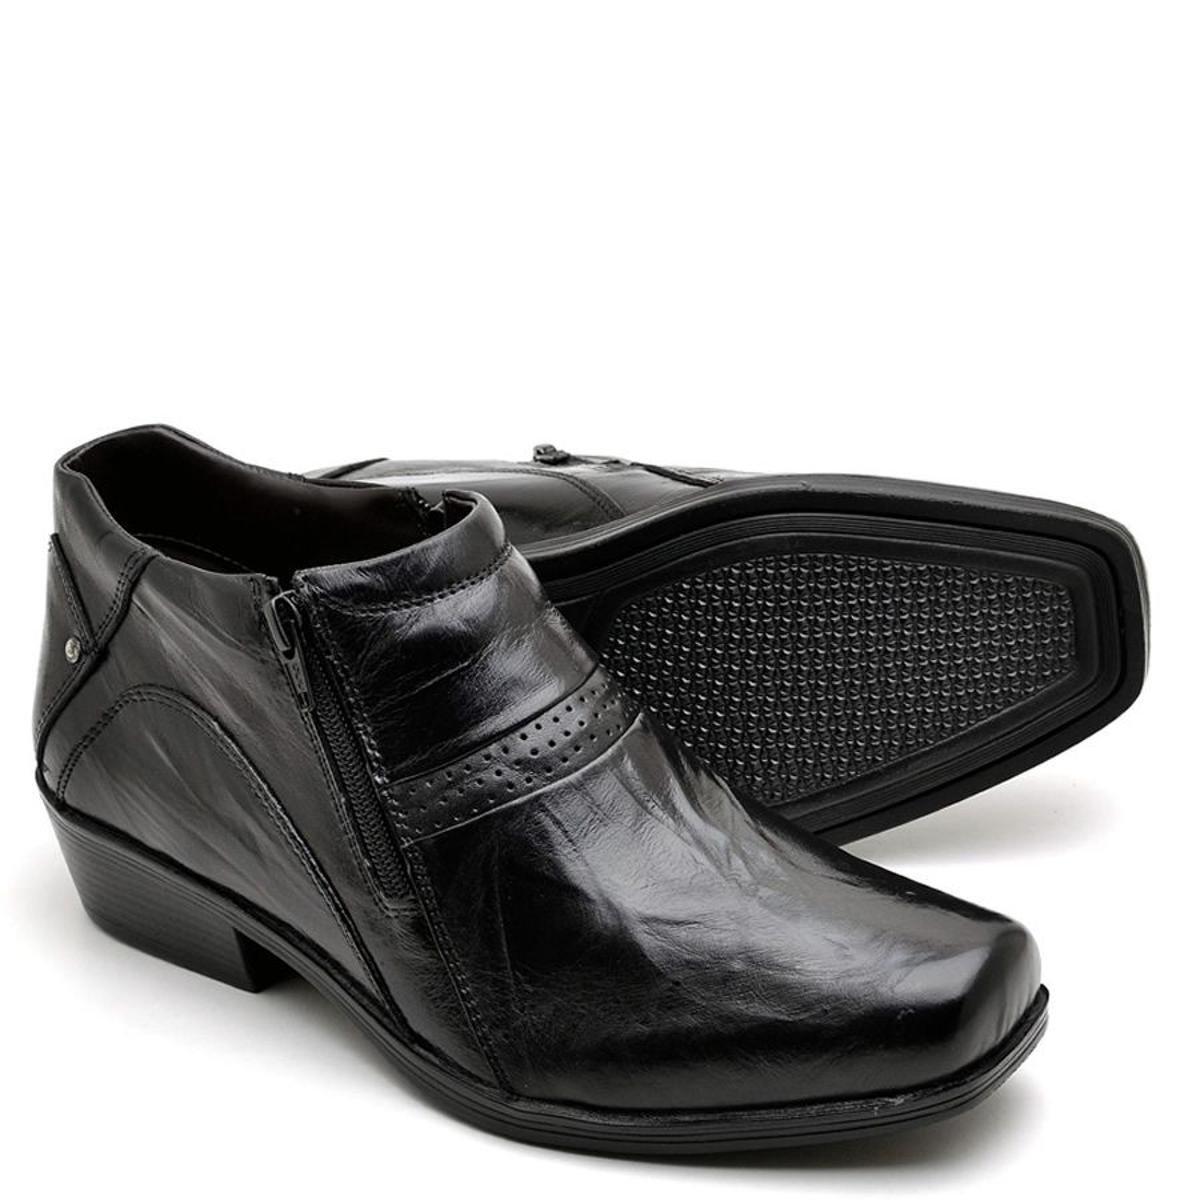 3b57cf36c5fc0 Bota Top Franca Shoes Country Masculino - Preto - Compre Agora